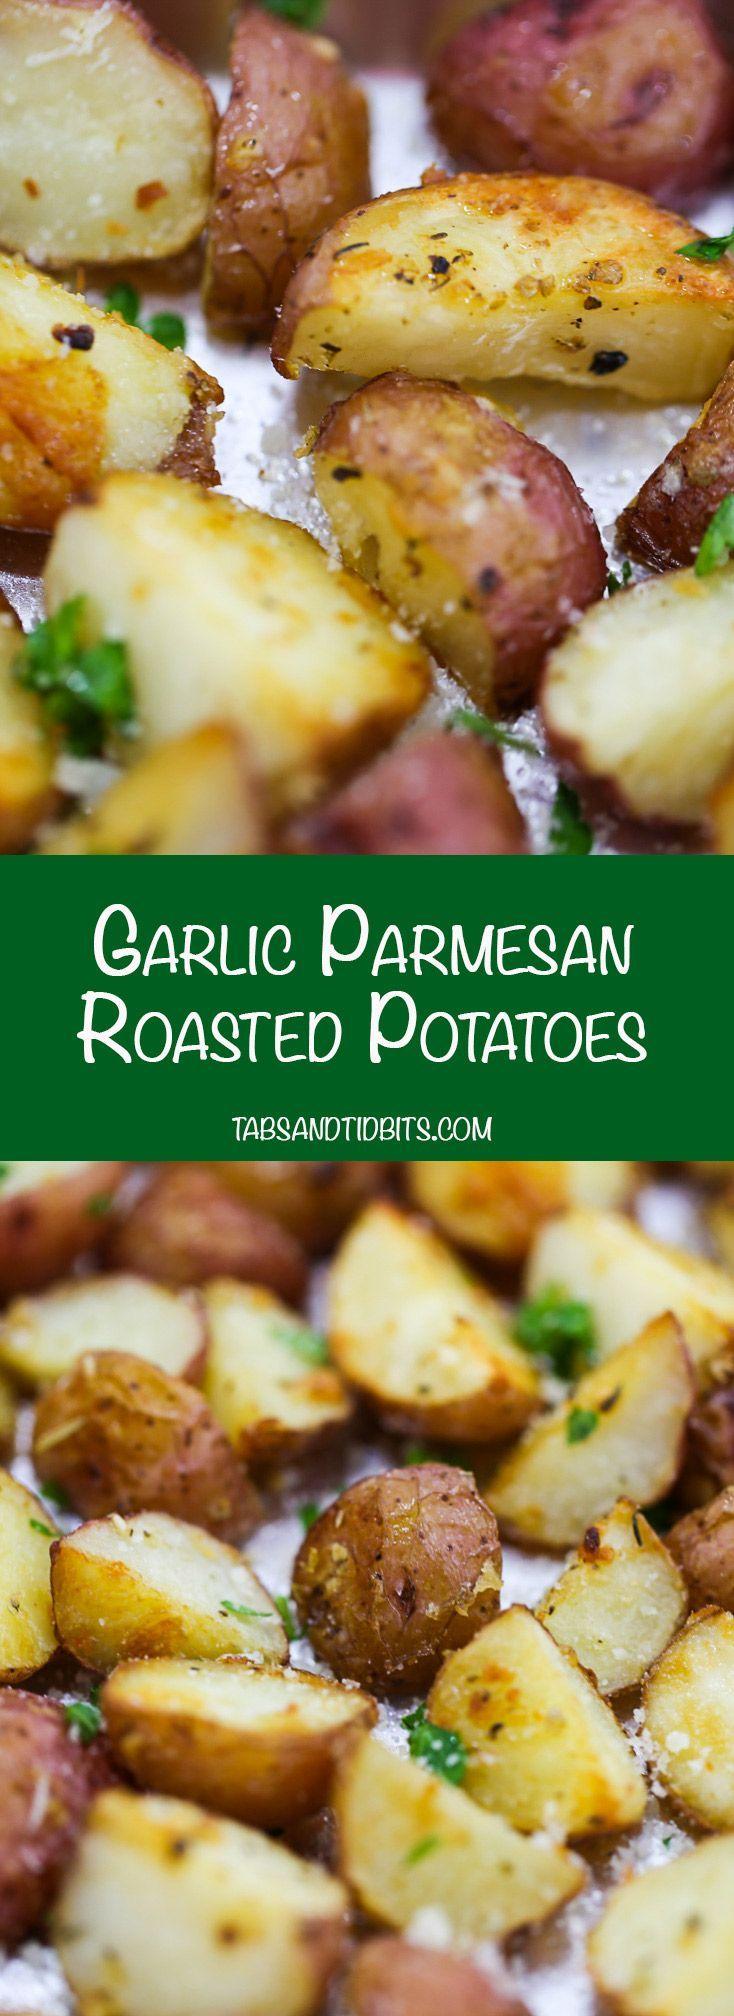 Garlic Parmesan Roasted Potatoes - Perfectly seasoned and crispy oven-roasted potatoes.